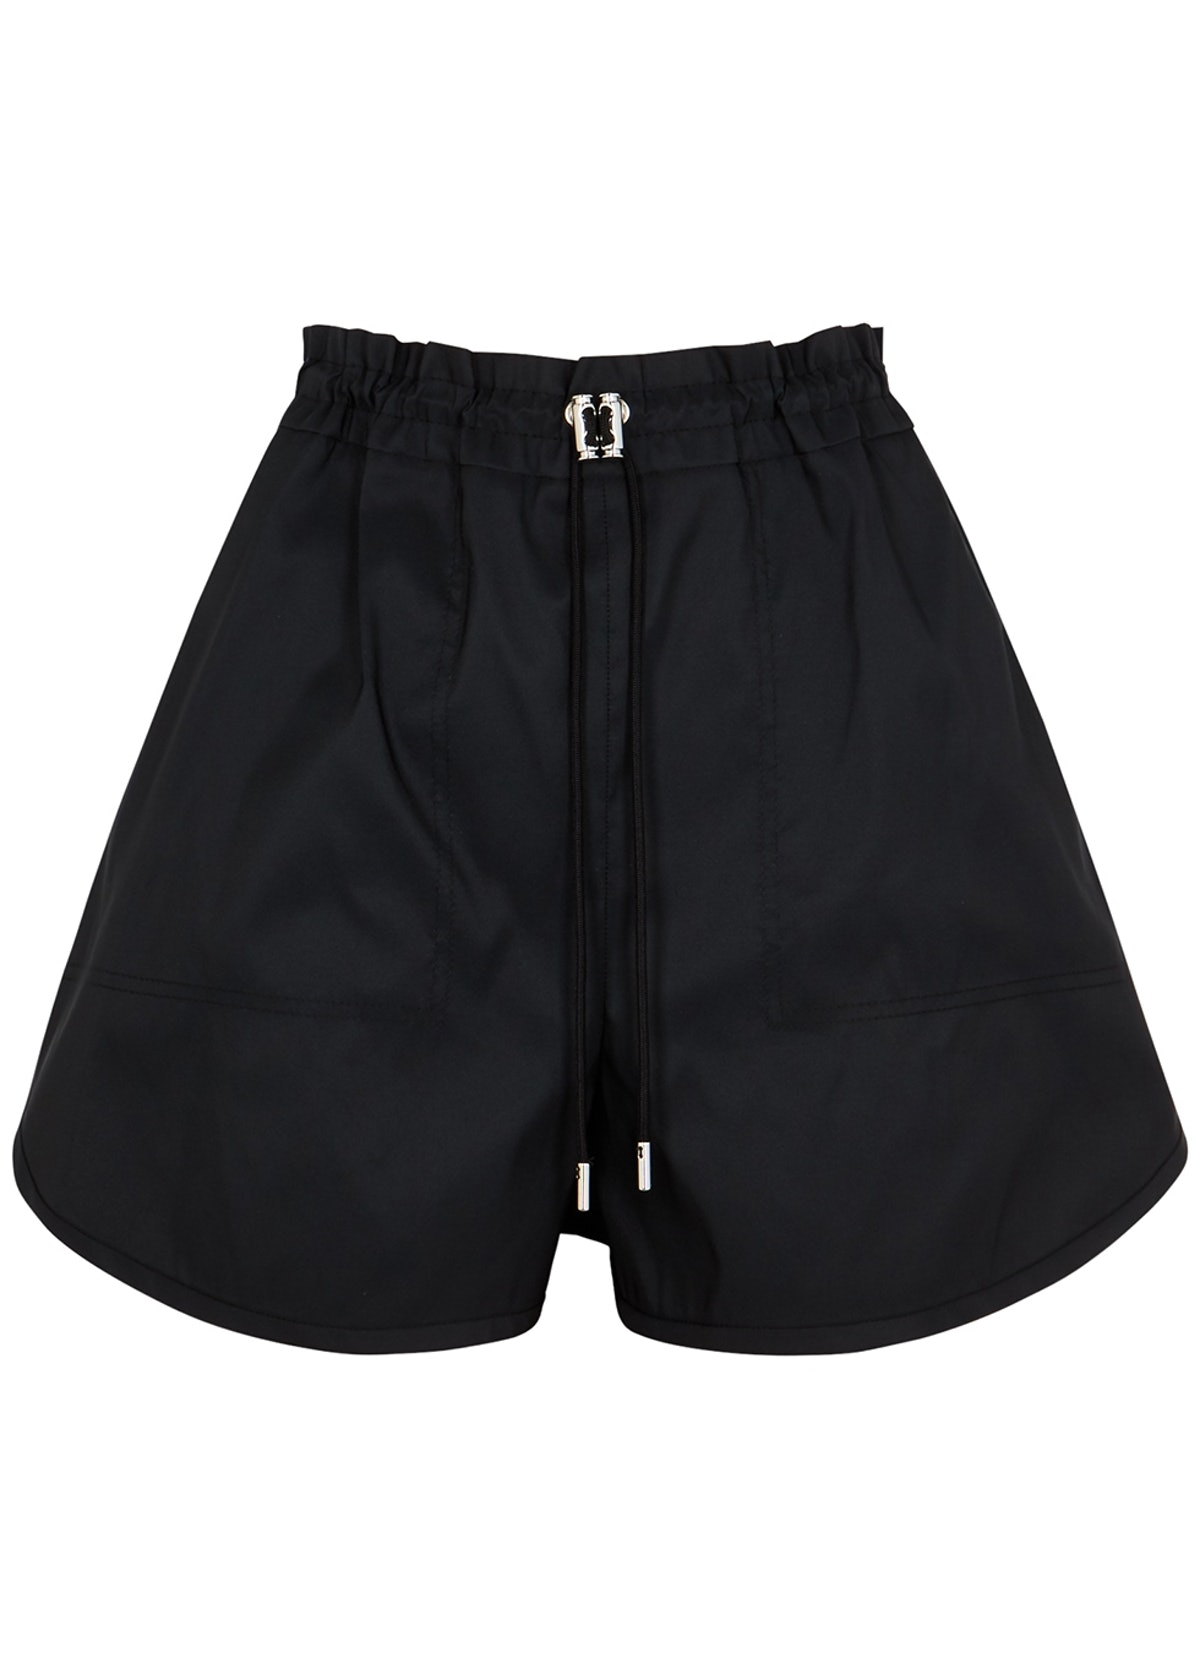 Black satin-twill shorts: image 1